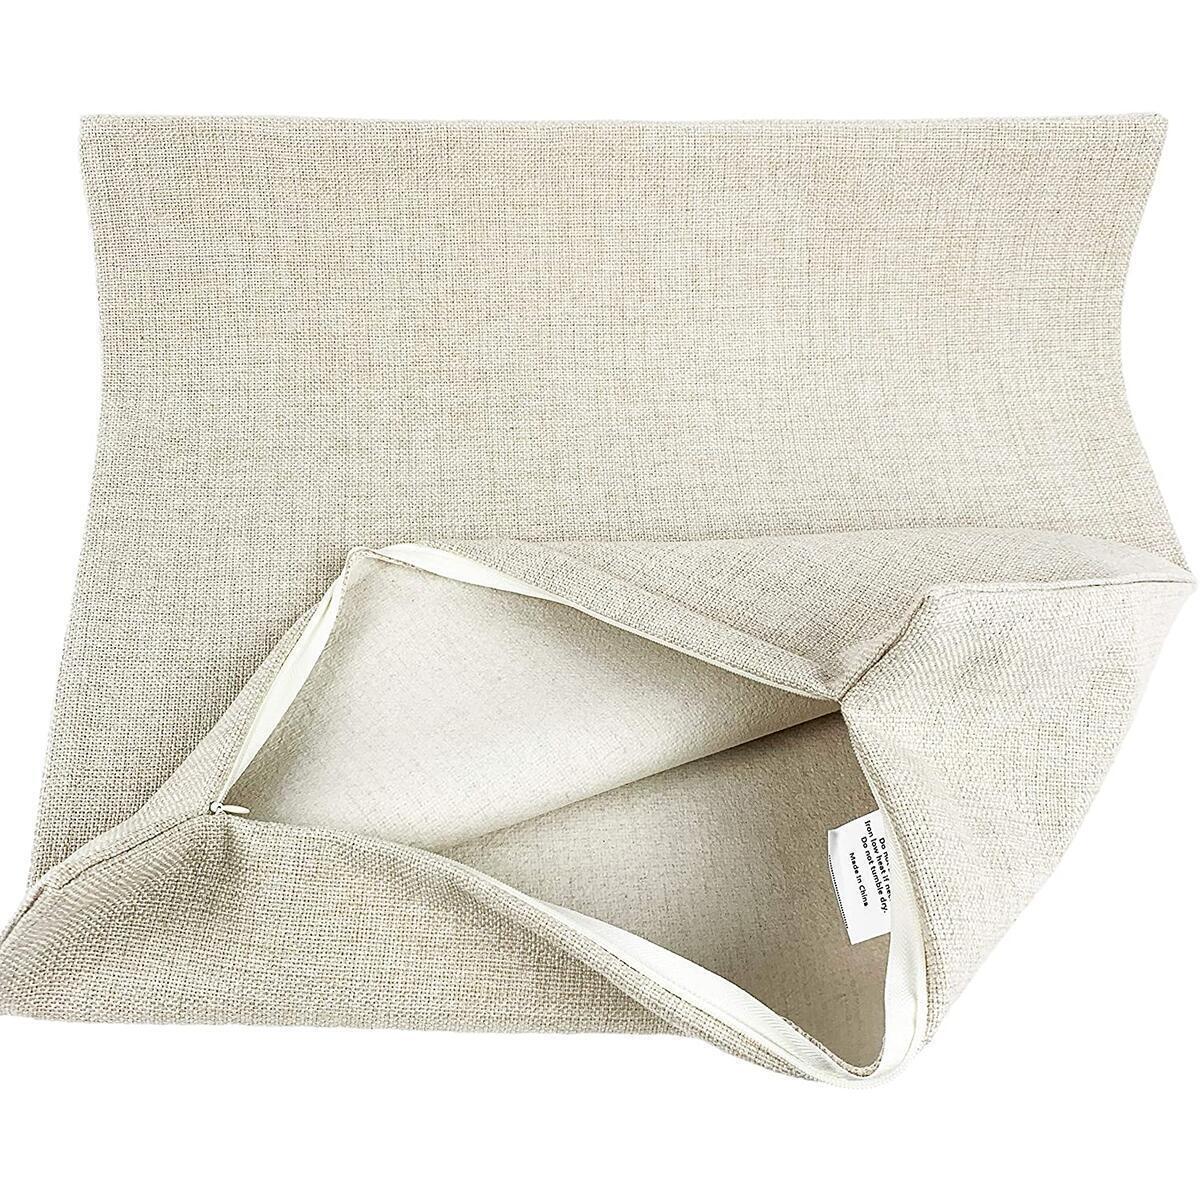 DrupsCo 18x18 Squid Pillow Cover for Couches - Ocean Decor Pillow Cover, Cotton Linen Coastal Decor Beach Theme Pillow Covers